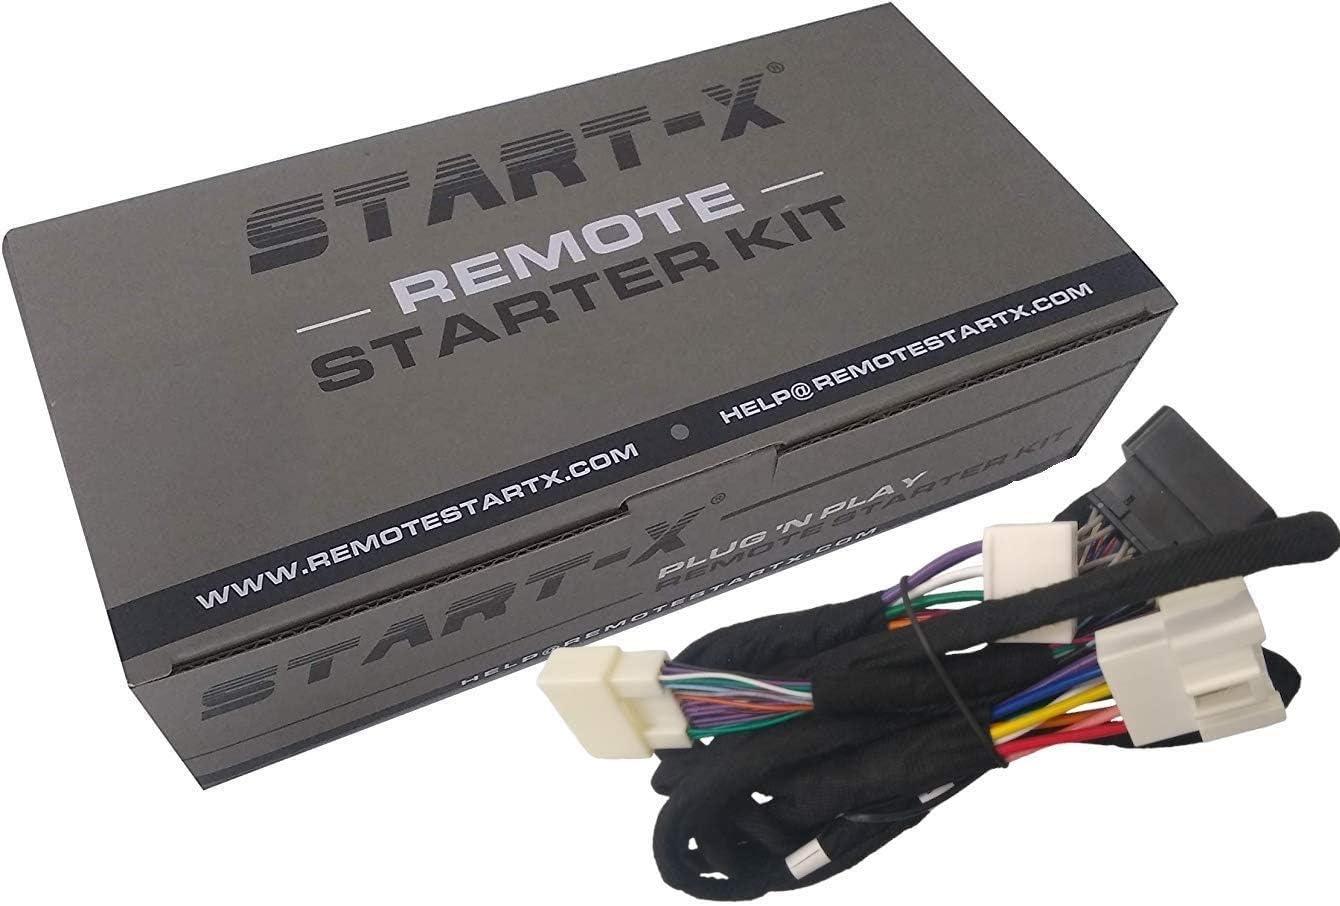 Start-X Remote Starter for Tacoma 2016-2021 || Highlander 14-19 Key Start || Plug N Play | 3 X Lock to Remote Start